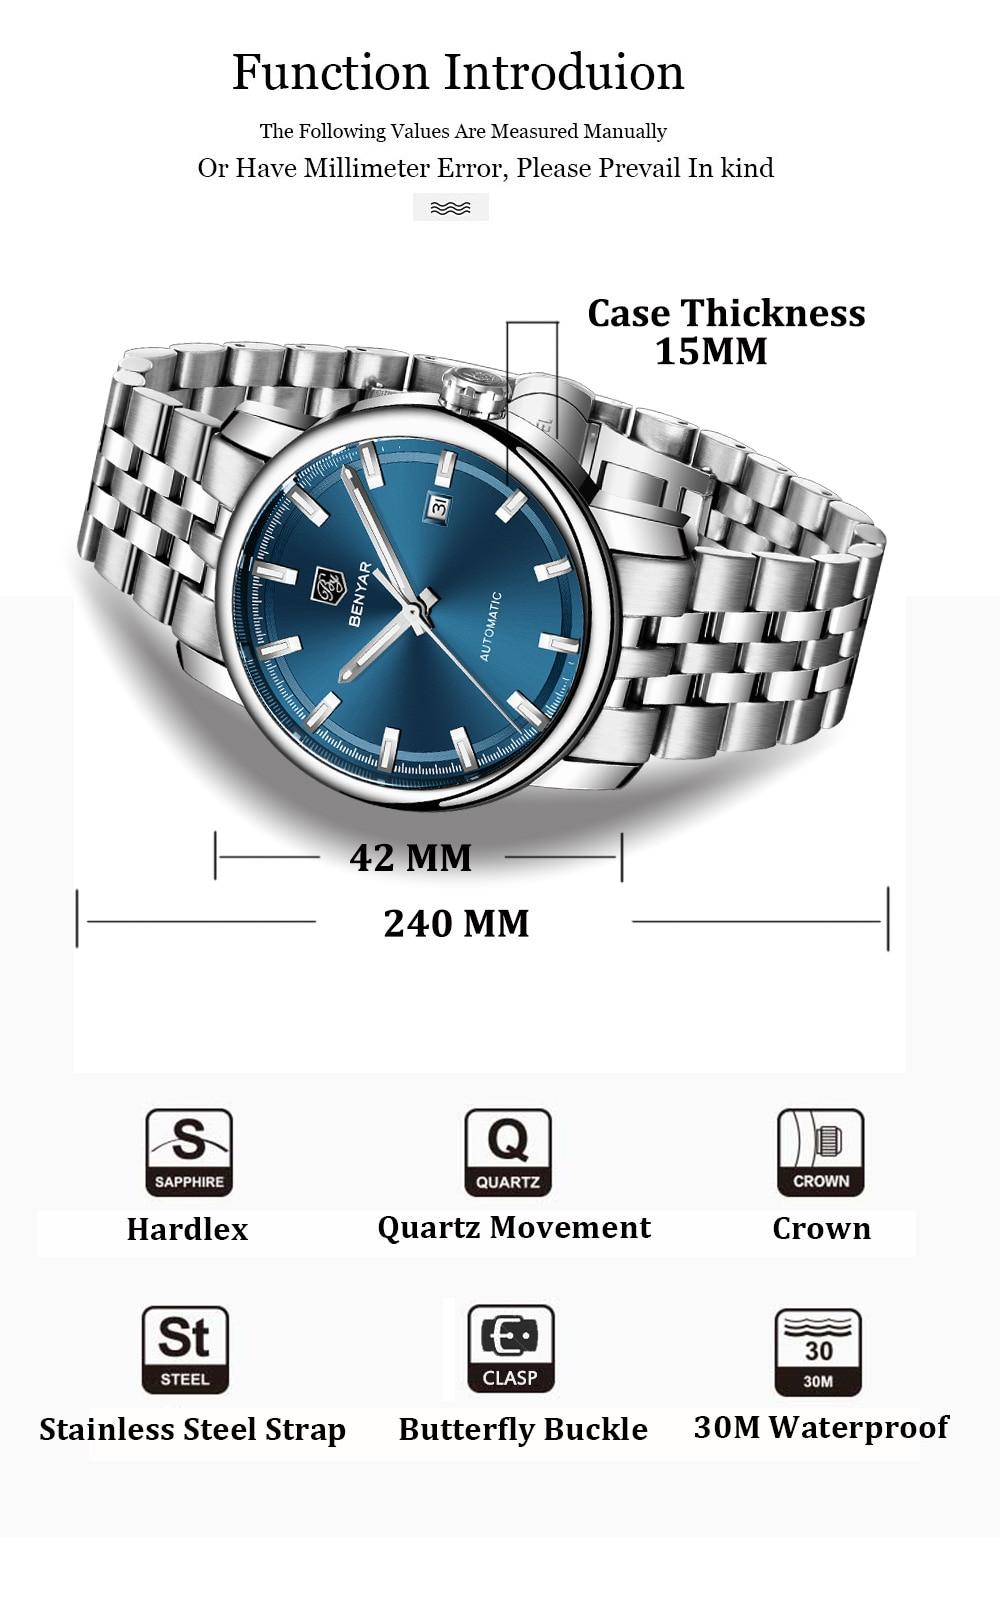 HTB1.c1laWSs3KVjSZPiq6AsiVXaY New BENYAR Men's Mechanical Watches Automatic Mens watches Top Brand Luxury watch men WristWatch Military Relogio Masculino 2019